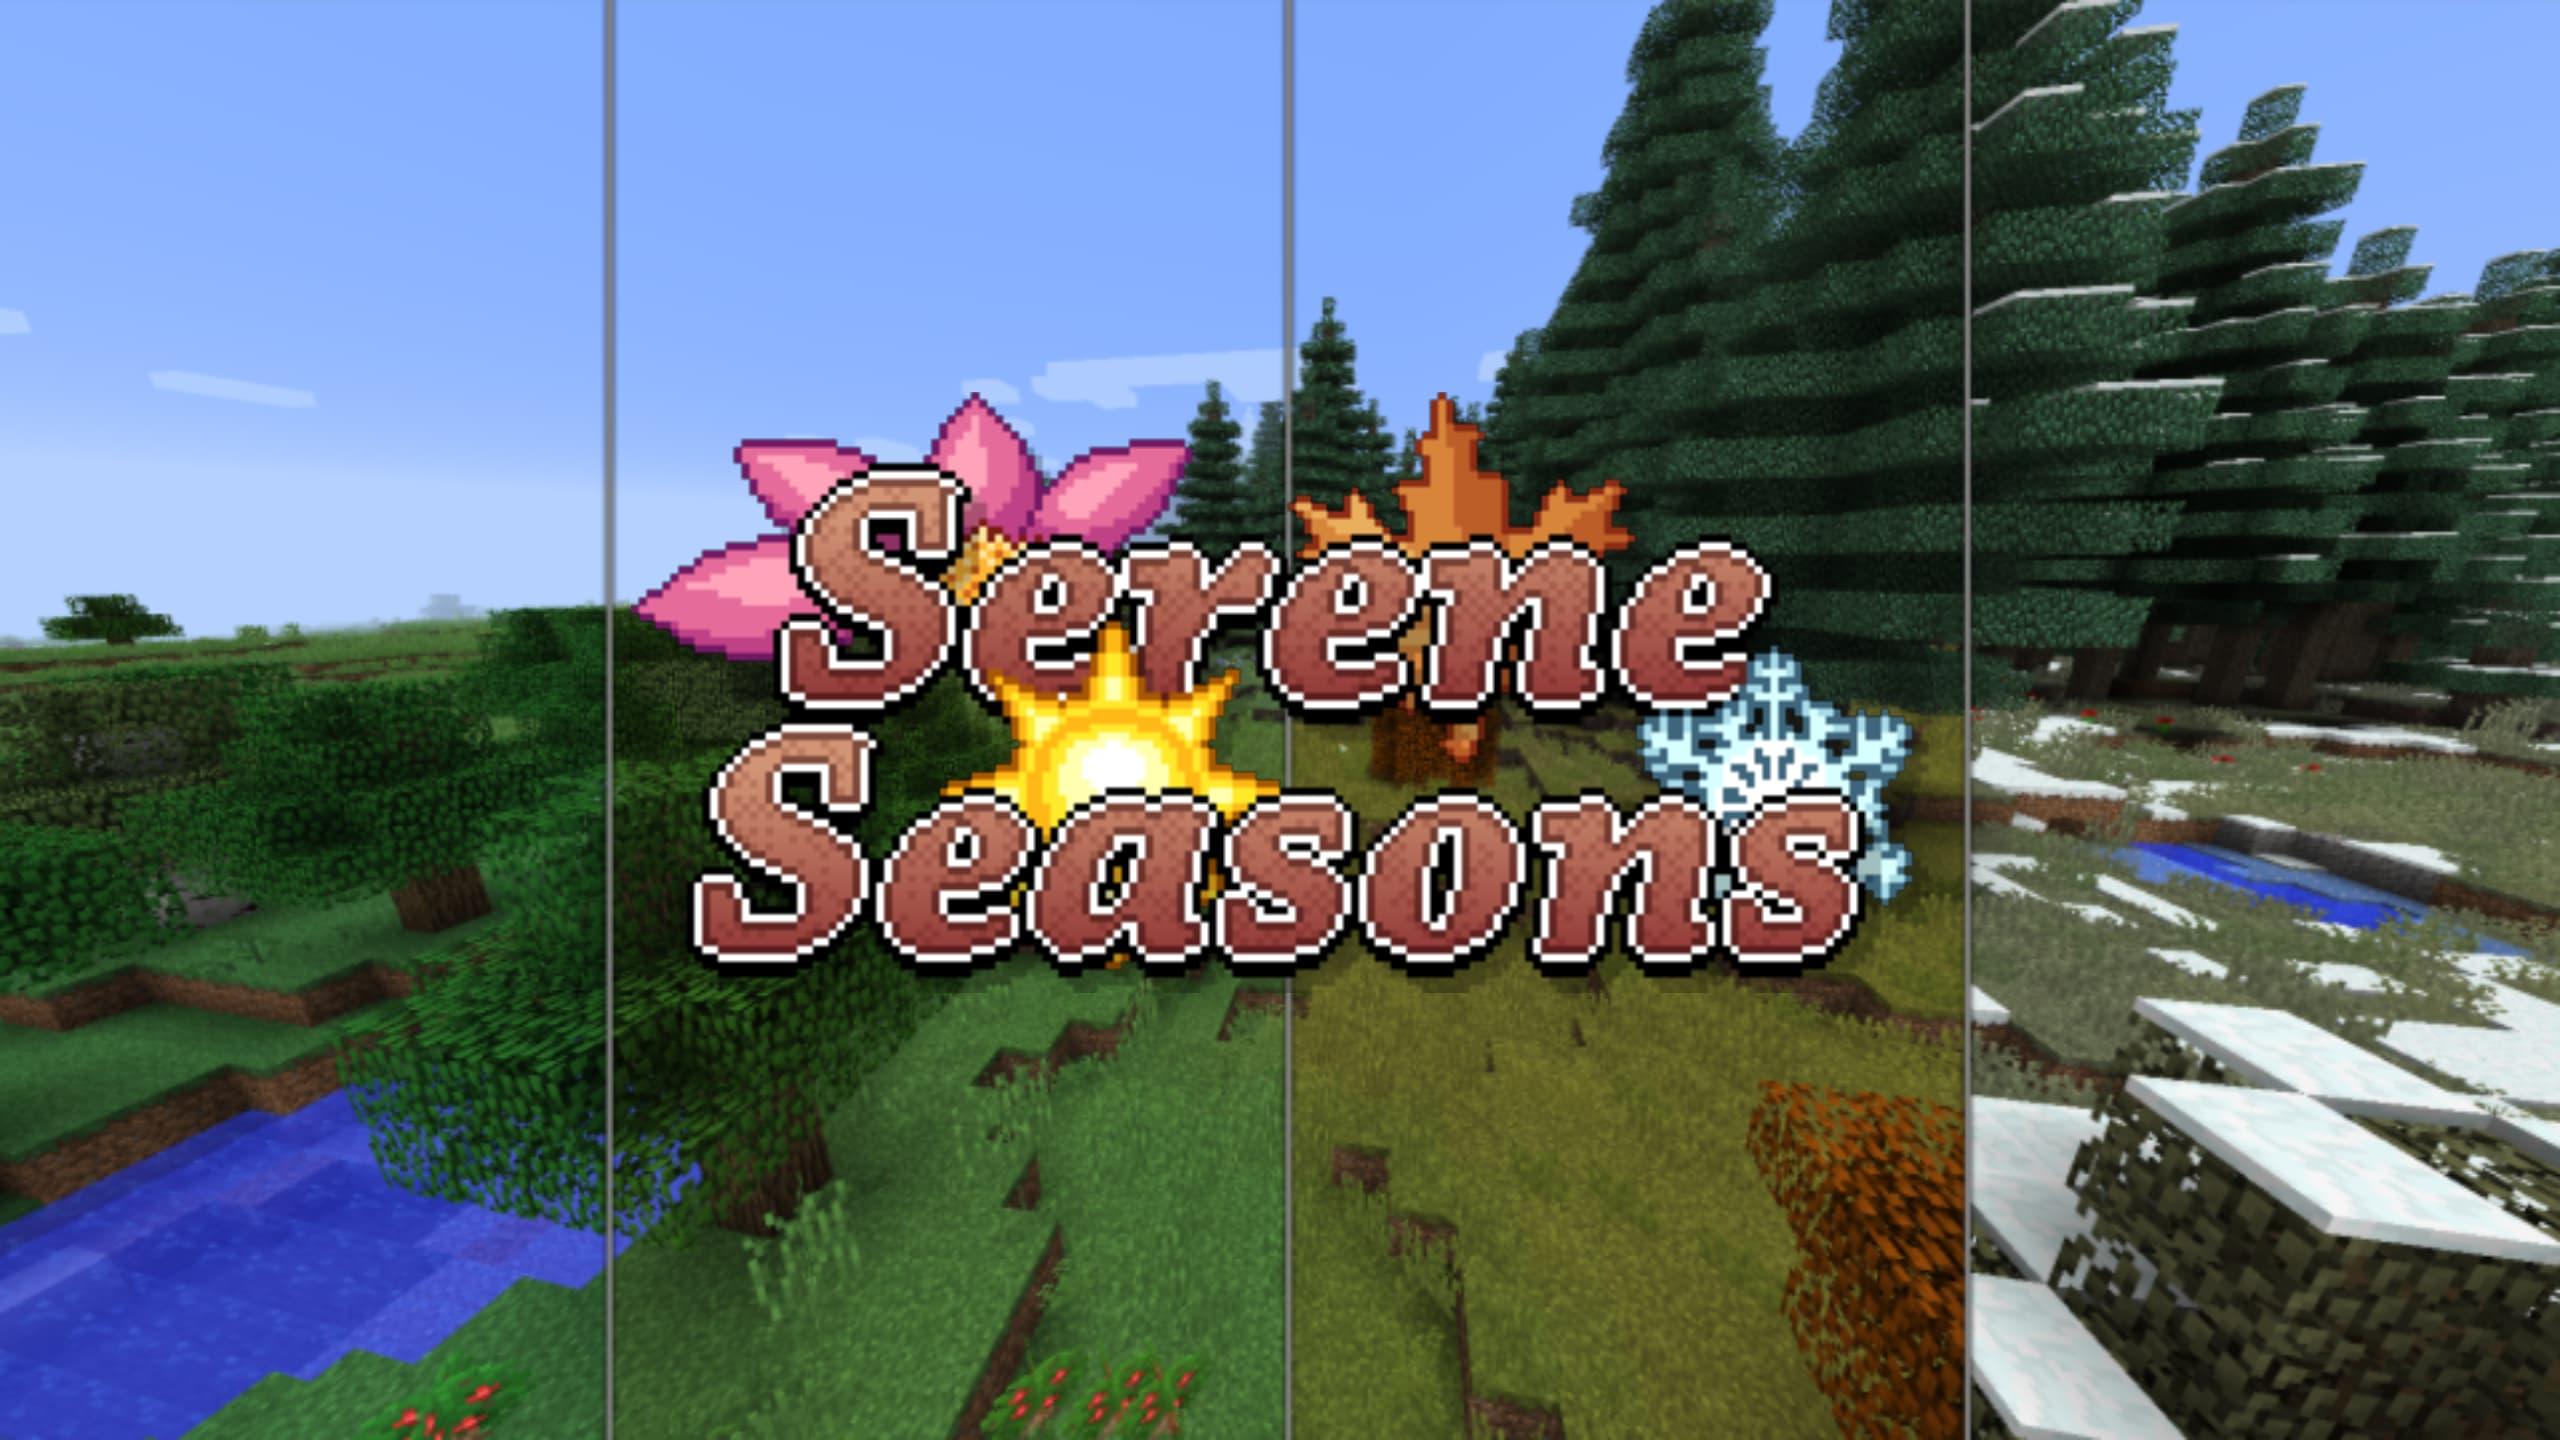 ☔️ [Mod] Temporadas tranquilas - 1.12.2 → 1.16.5 • Minecraft.fr